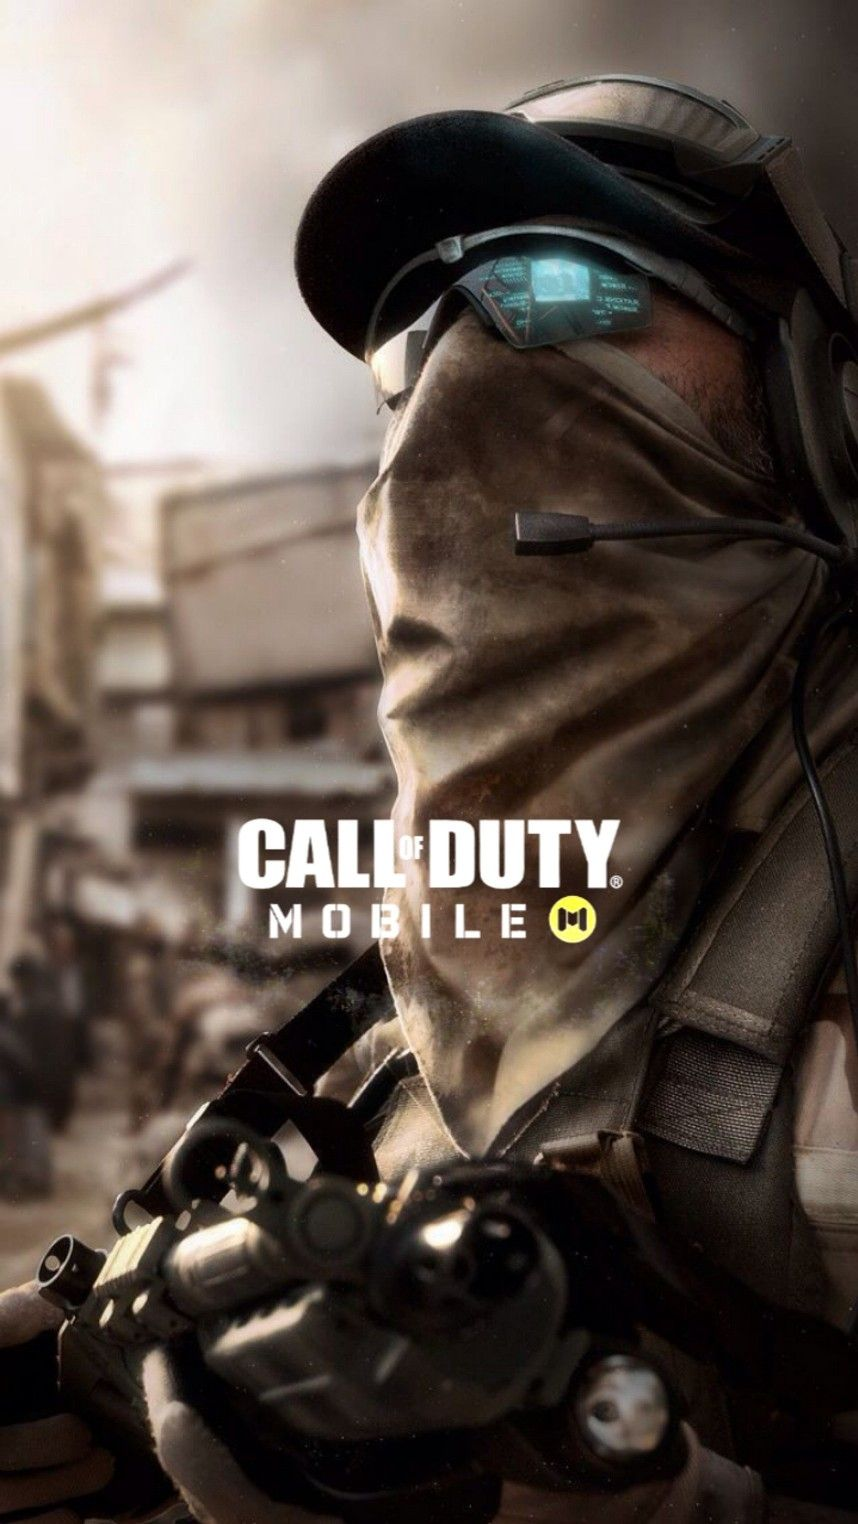 Call Of Duty Mobile 1020p Hd Walpaper Papeis De Parede De